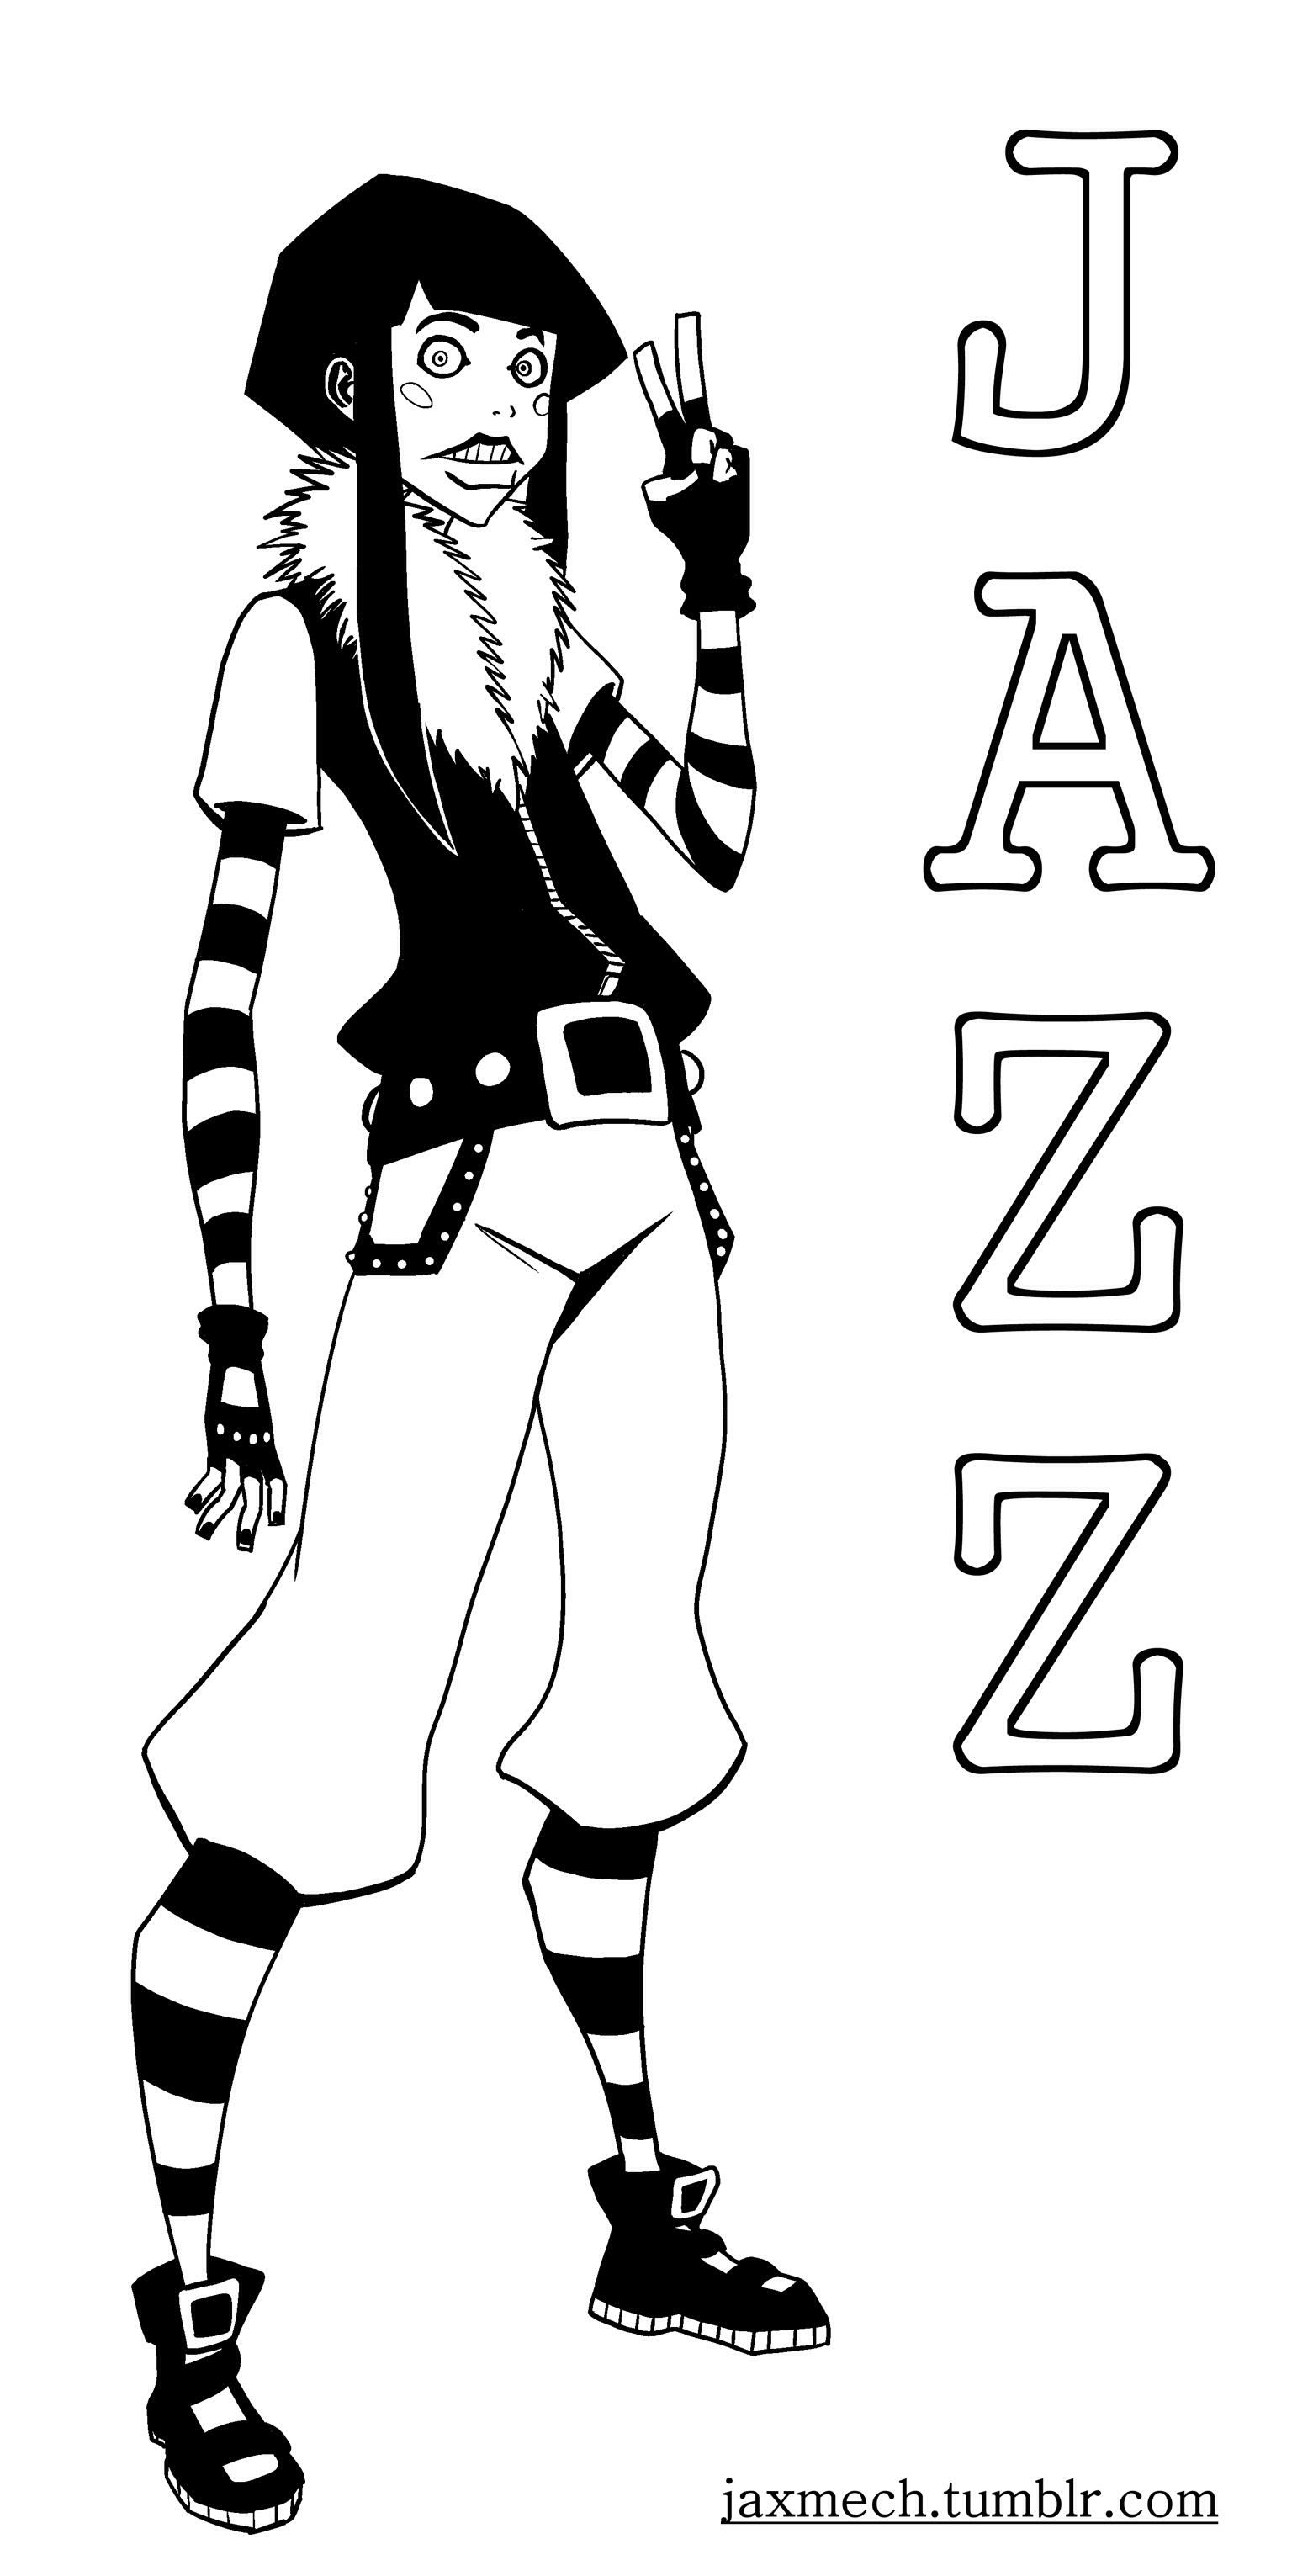 Character # 1